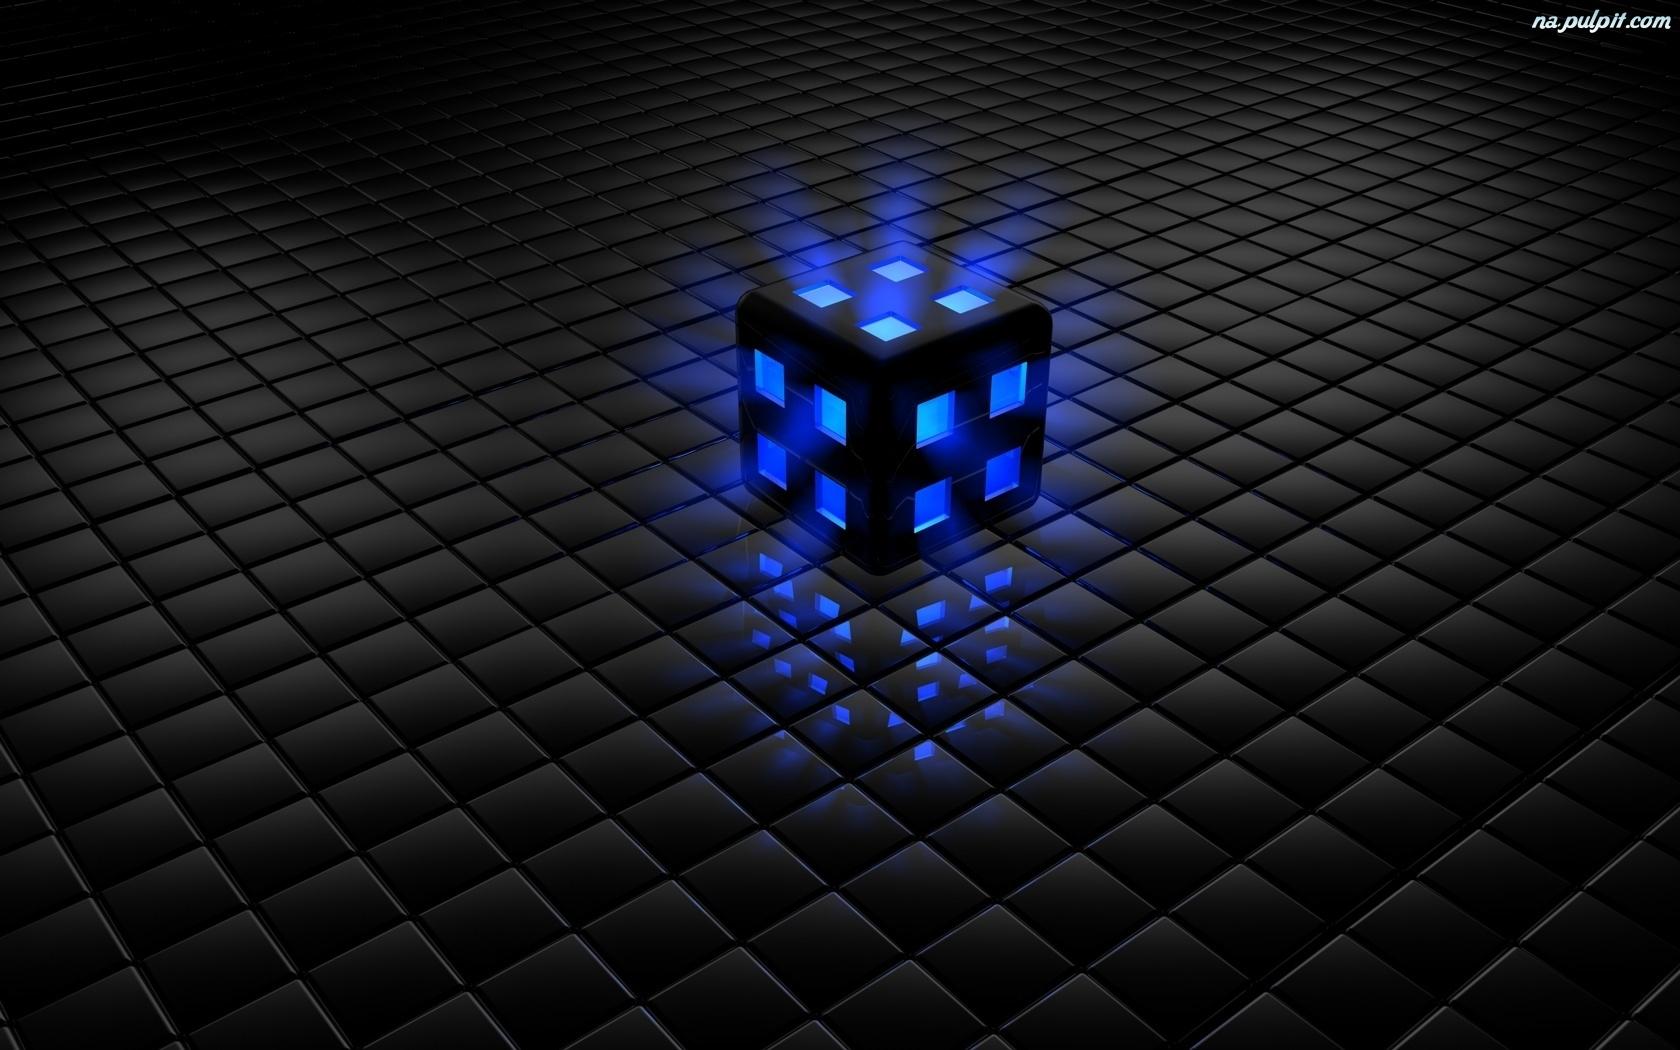 3d Kostka Podświetlona Grafika Na Pulpit